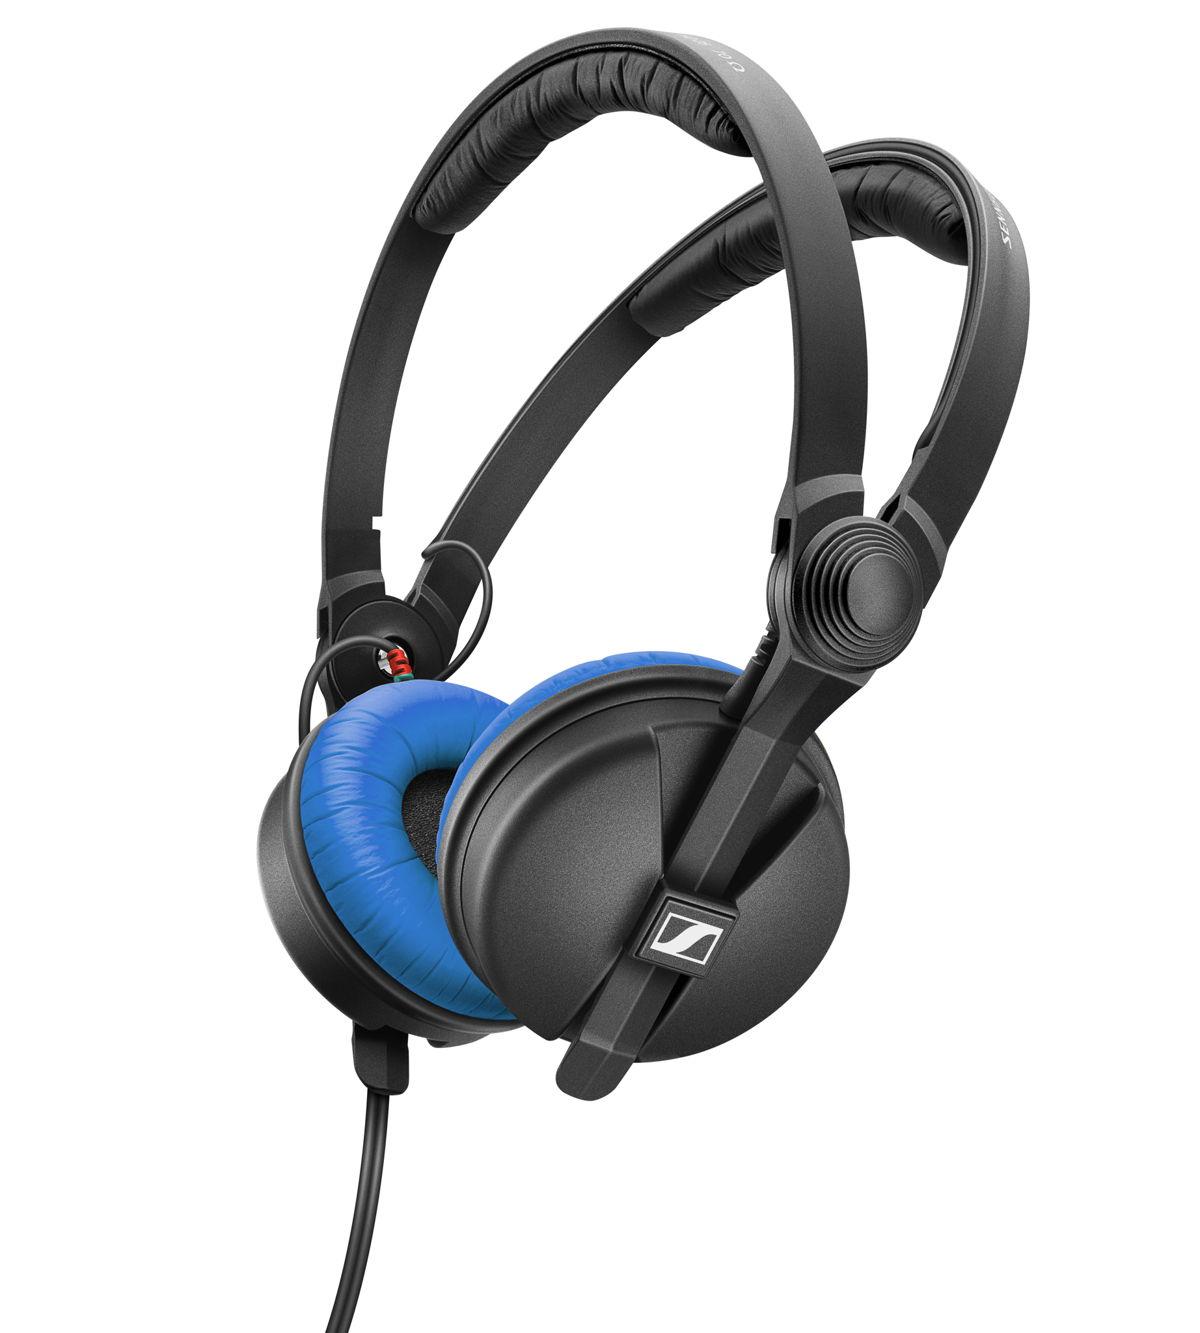 A legendary gift: The HD 25 BLUE